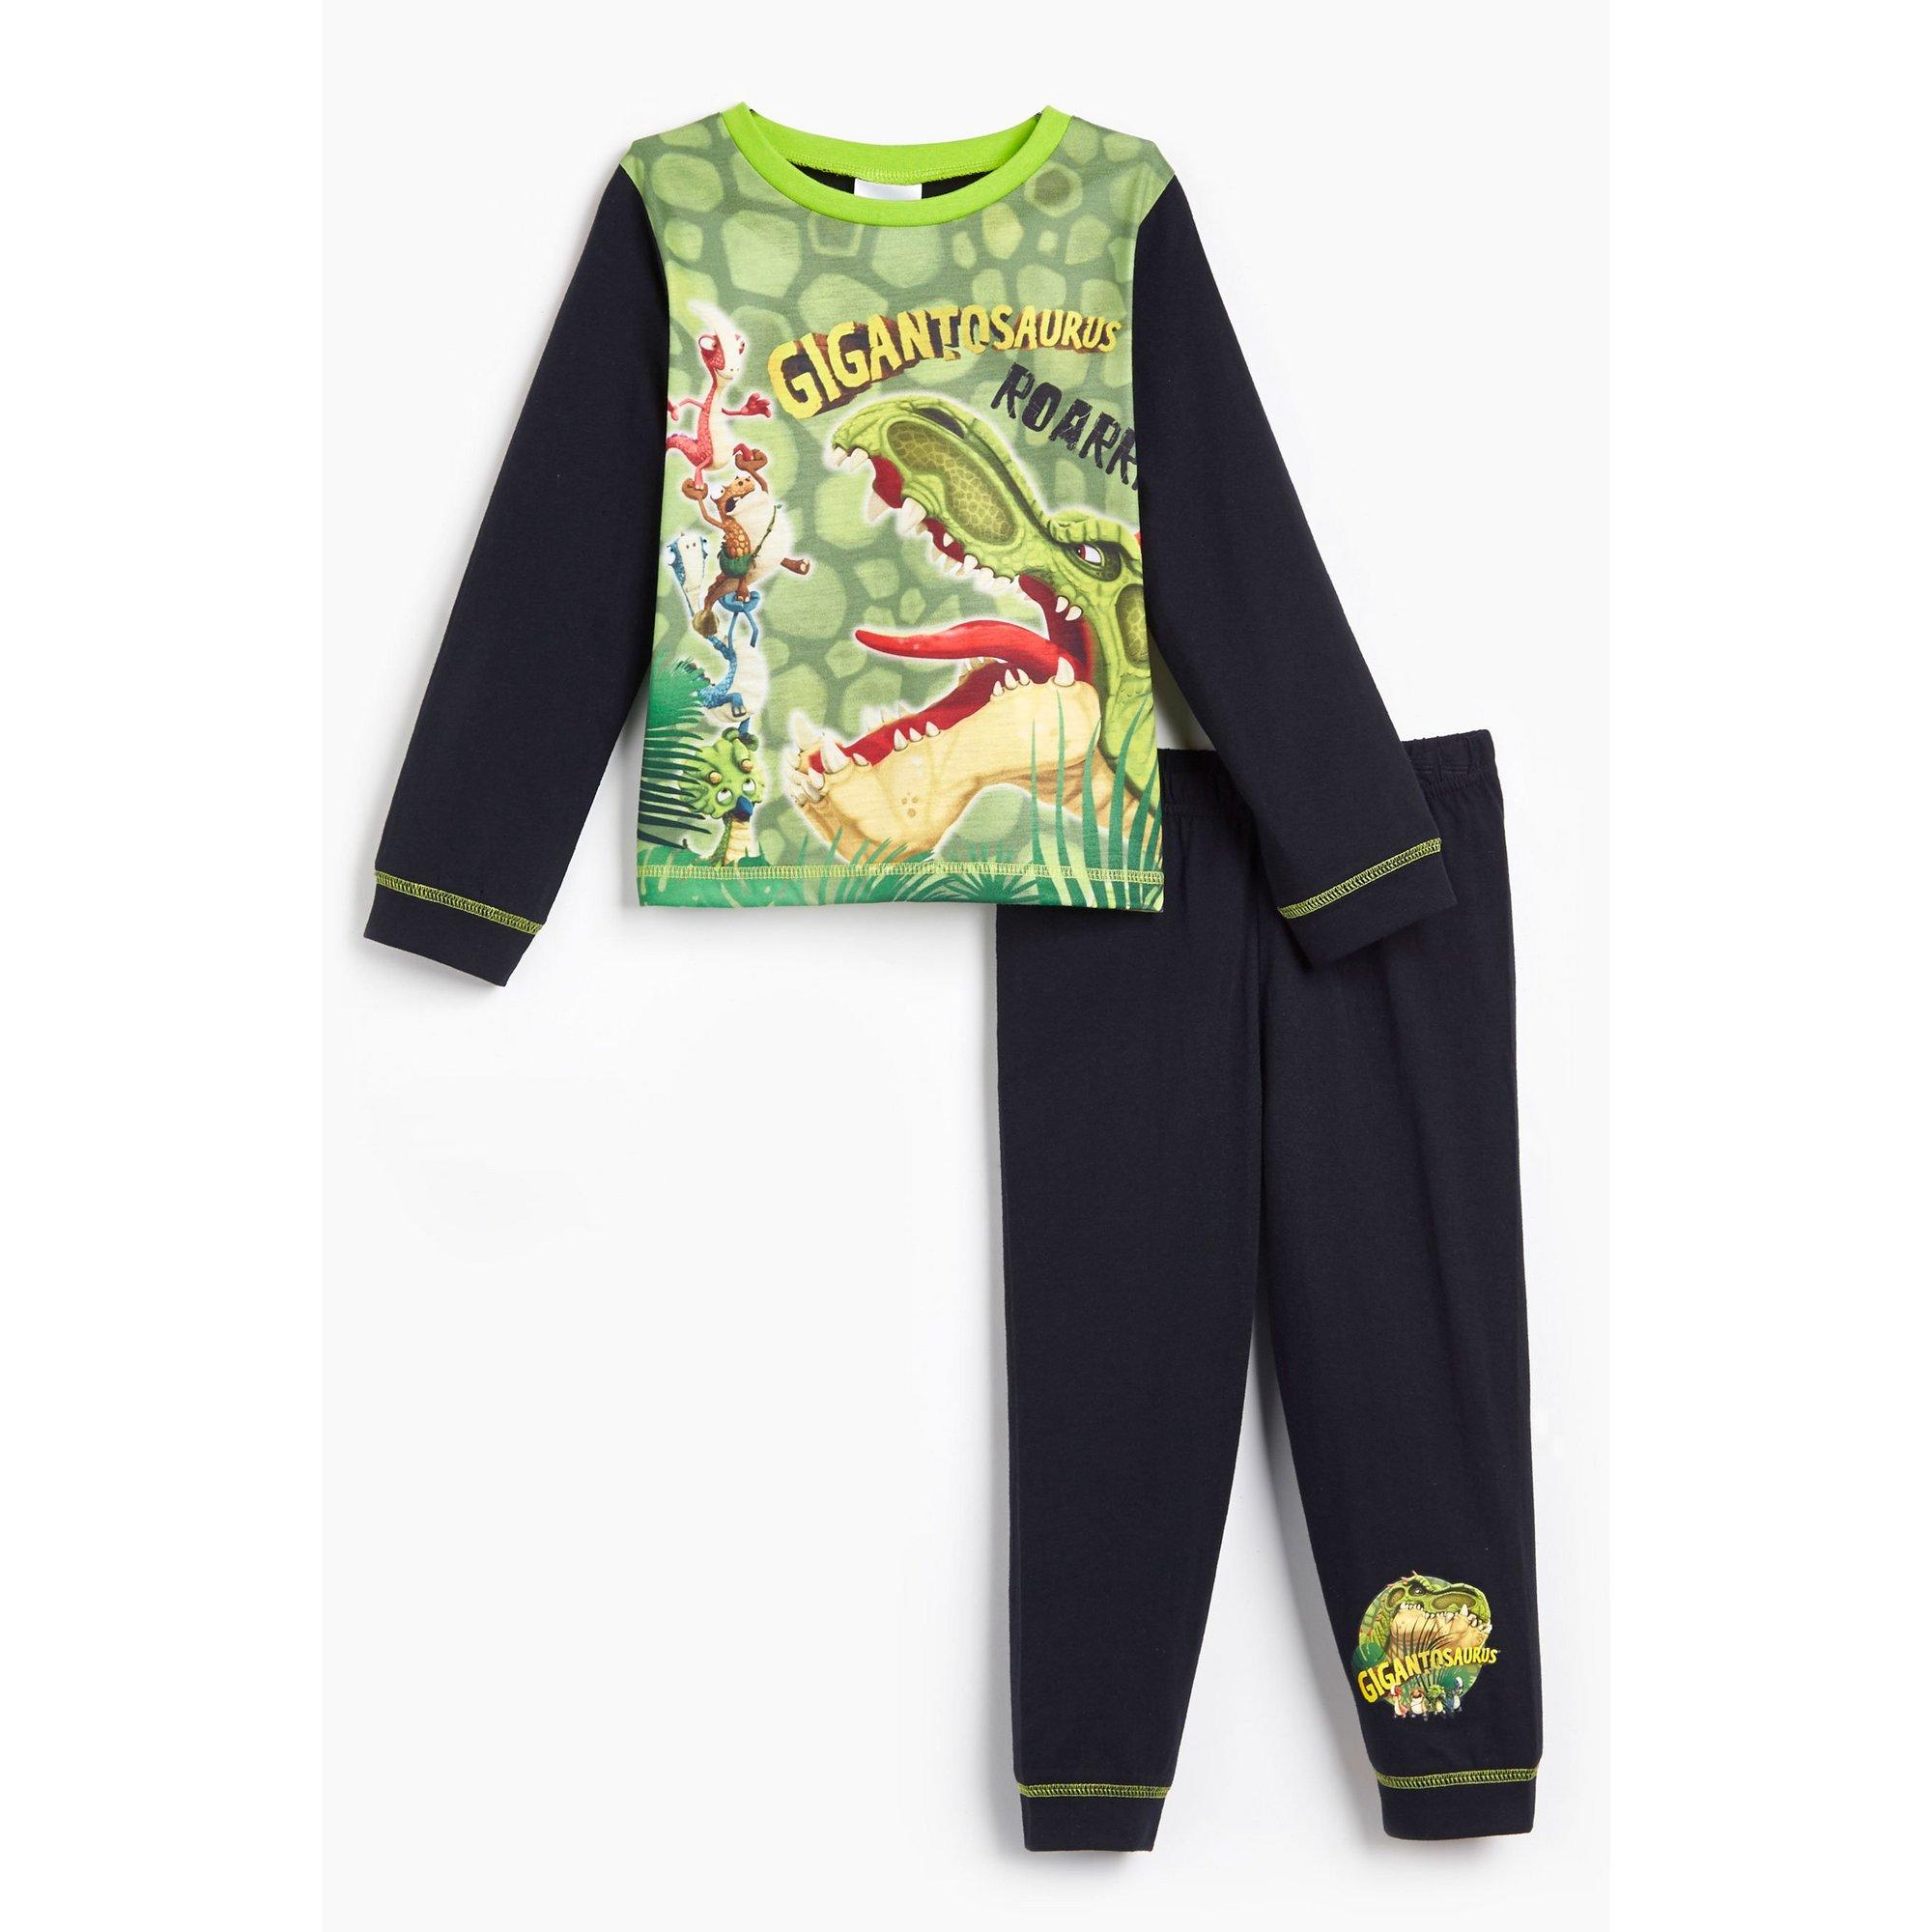 Image of Younger Boys Gigantosaurus Long Sleeve Pyjamas